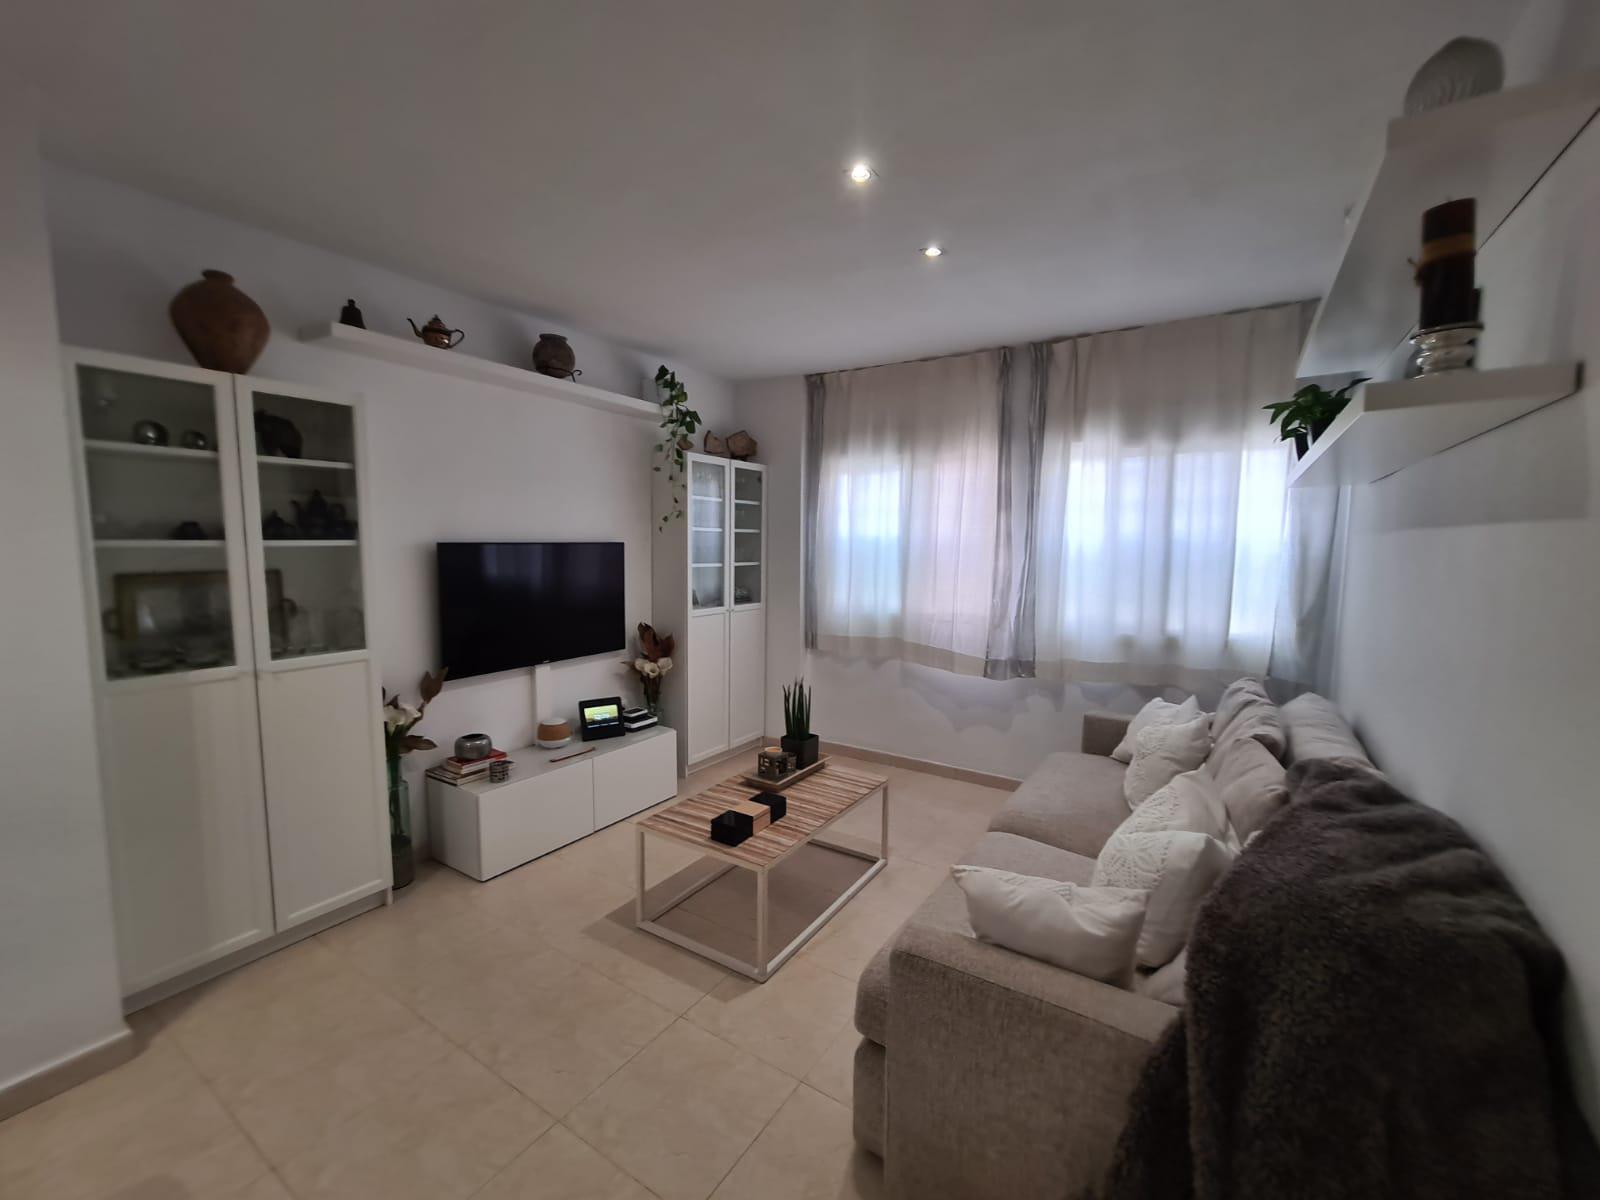 Imagen 3 Planta Baja en venta en Alicante/alacant / Barrio de San Agustín